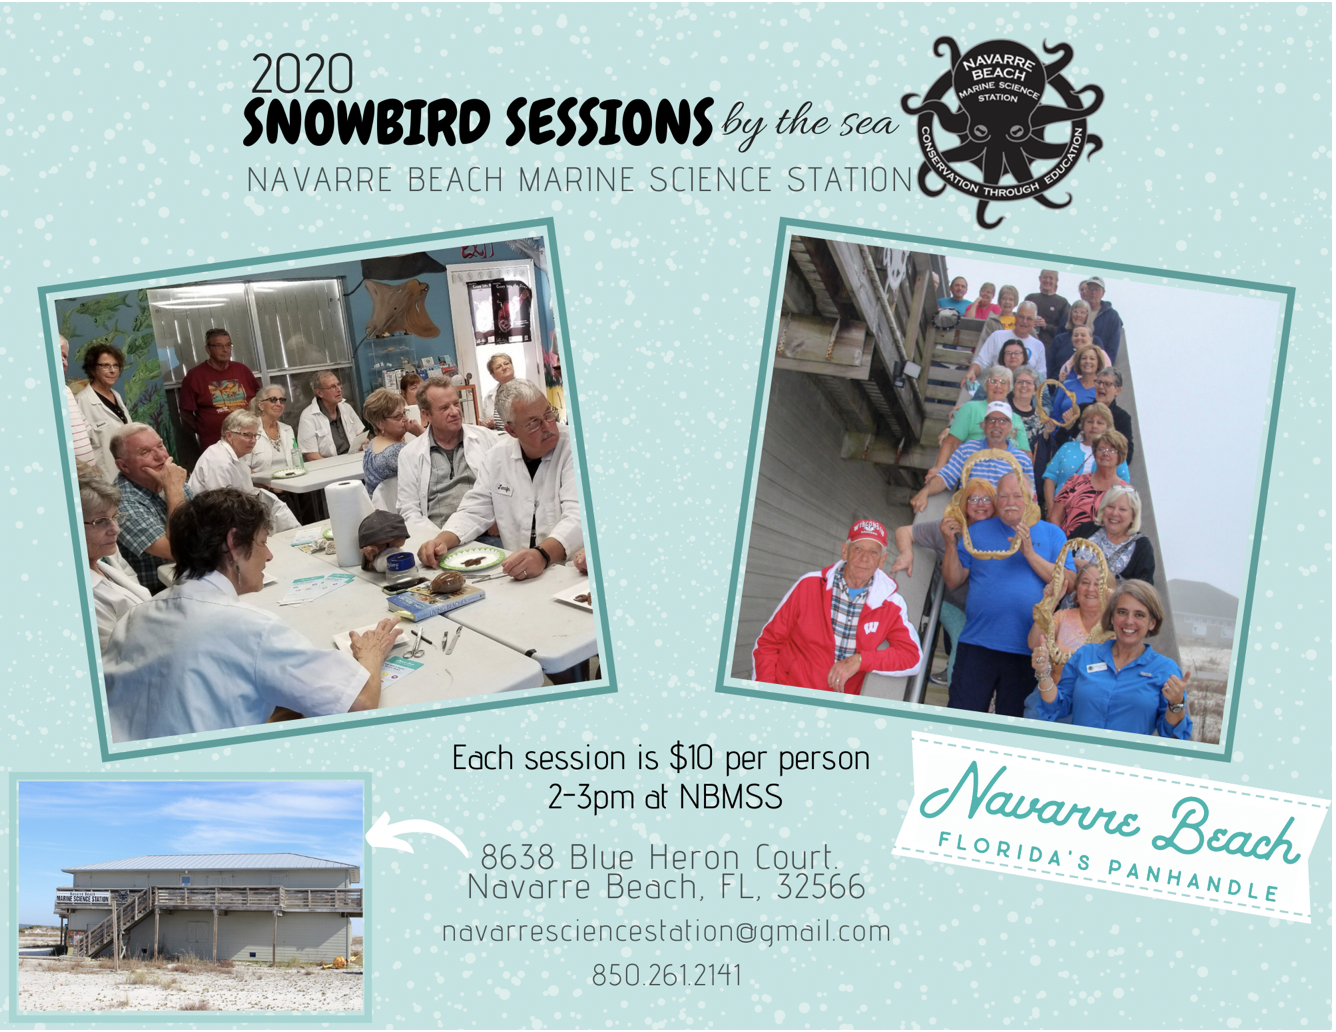 Snowbird Sessions 2020 flyer